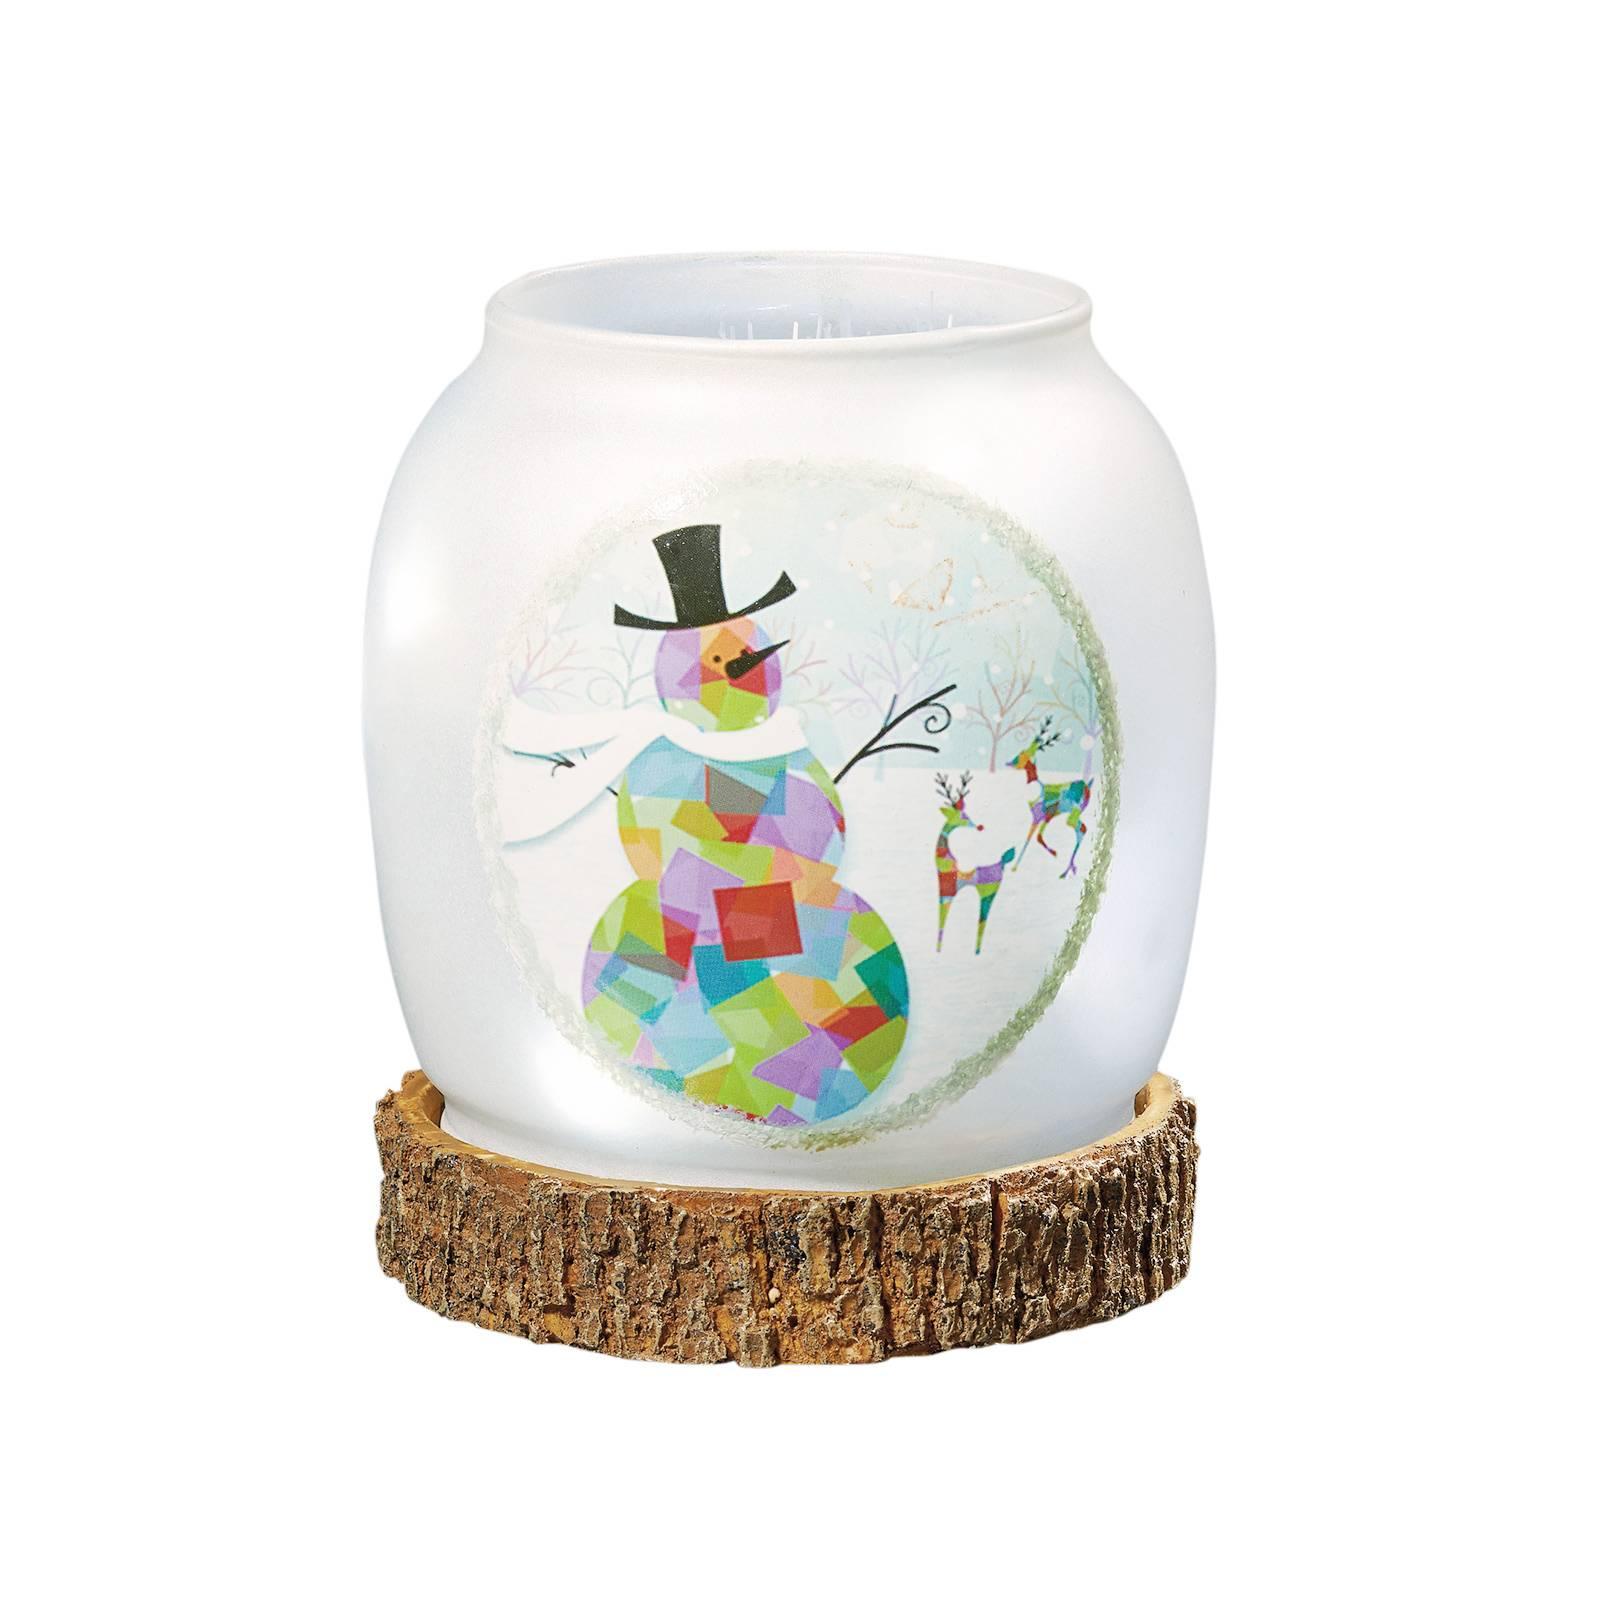 Snowman LED glass vase, battery-powered